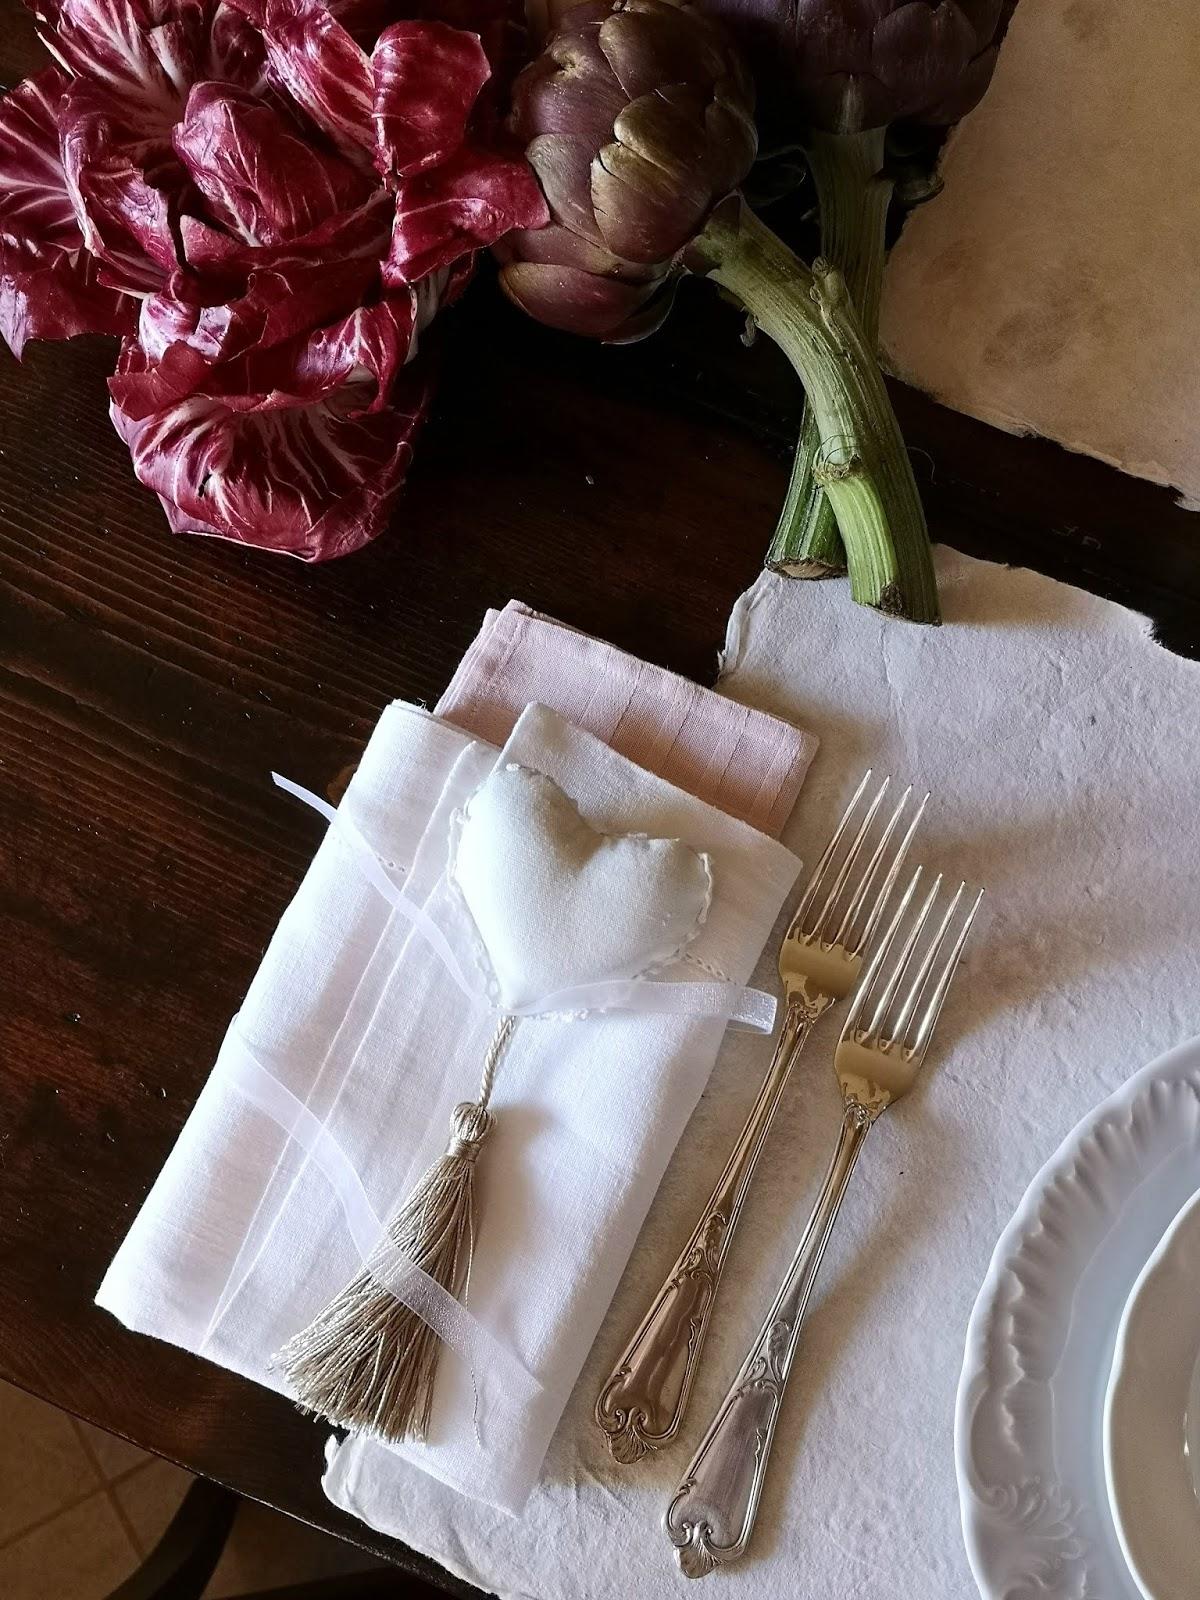 idee per la tavola di san valentino